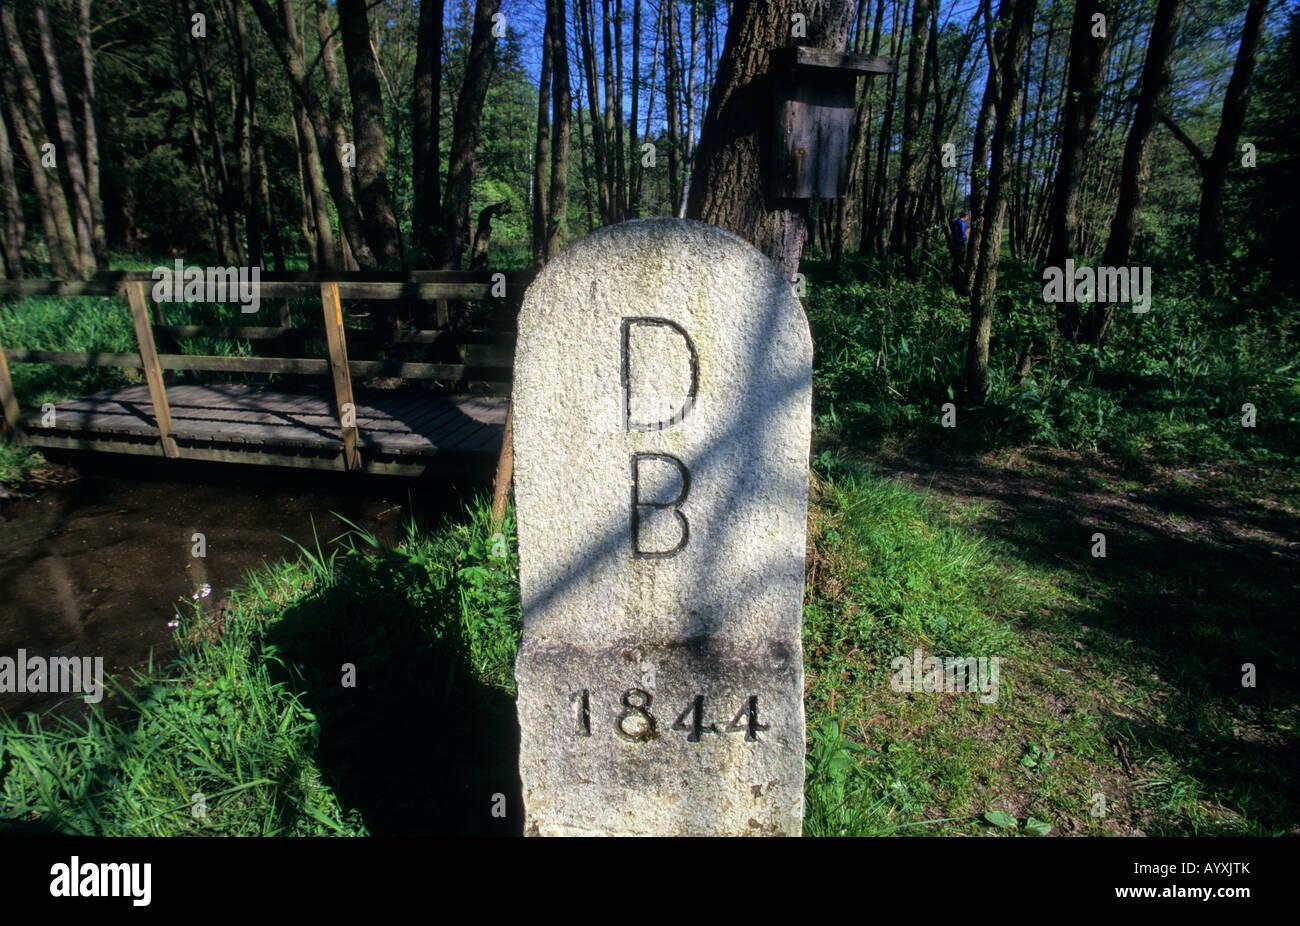 GERMANY DREILANDERECK DDR WEST GERMANY MEET CZECH REPUBLIC BORDER 3 THREE - Stock Image